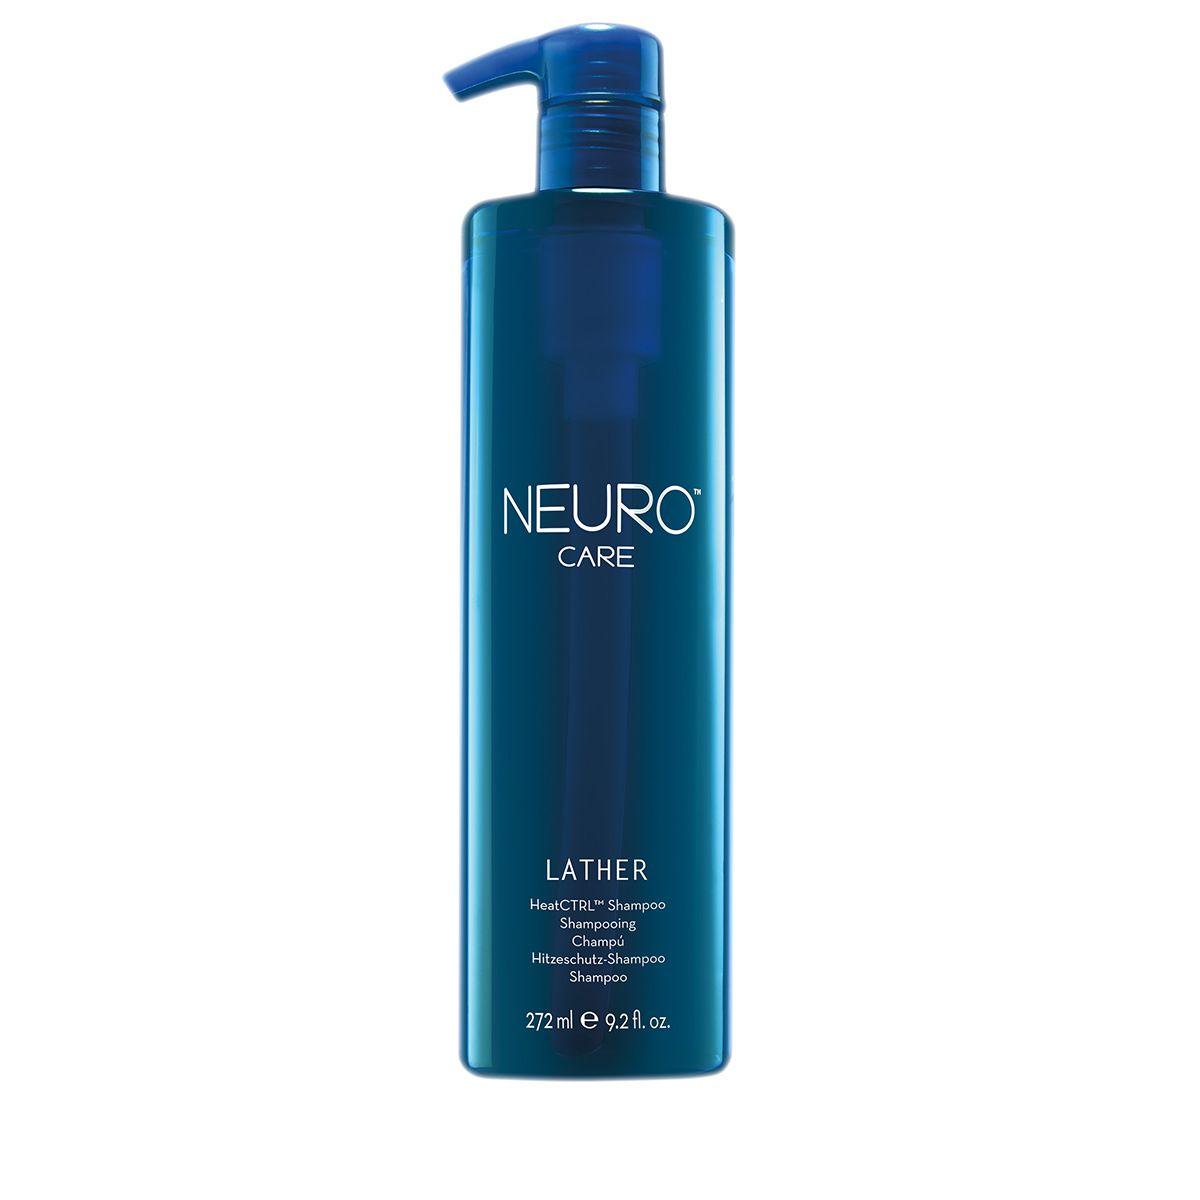 Paul Mitchell Neuro Liquid Neuro Lather HeatCTRL Shampoo 272ml